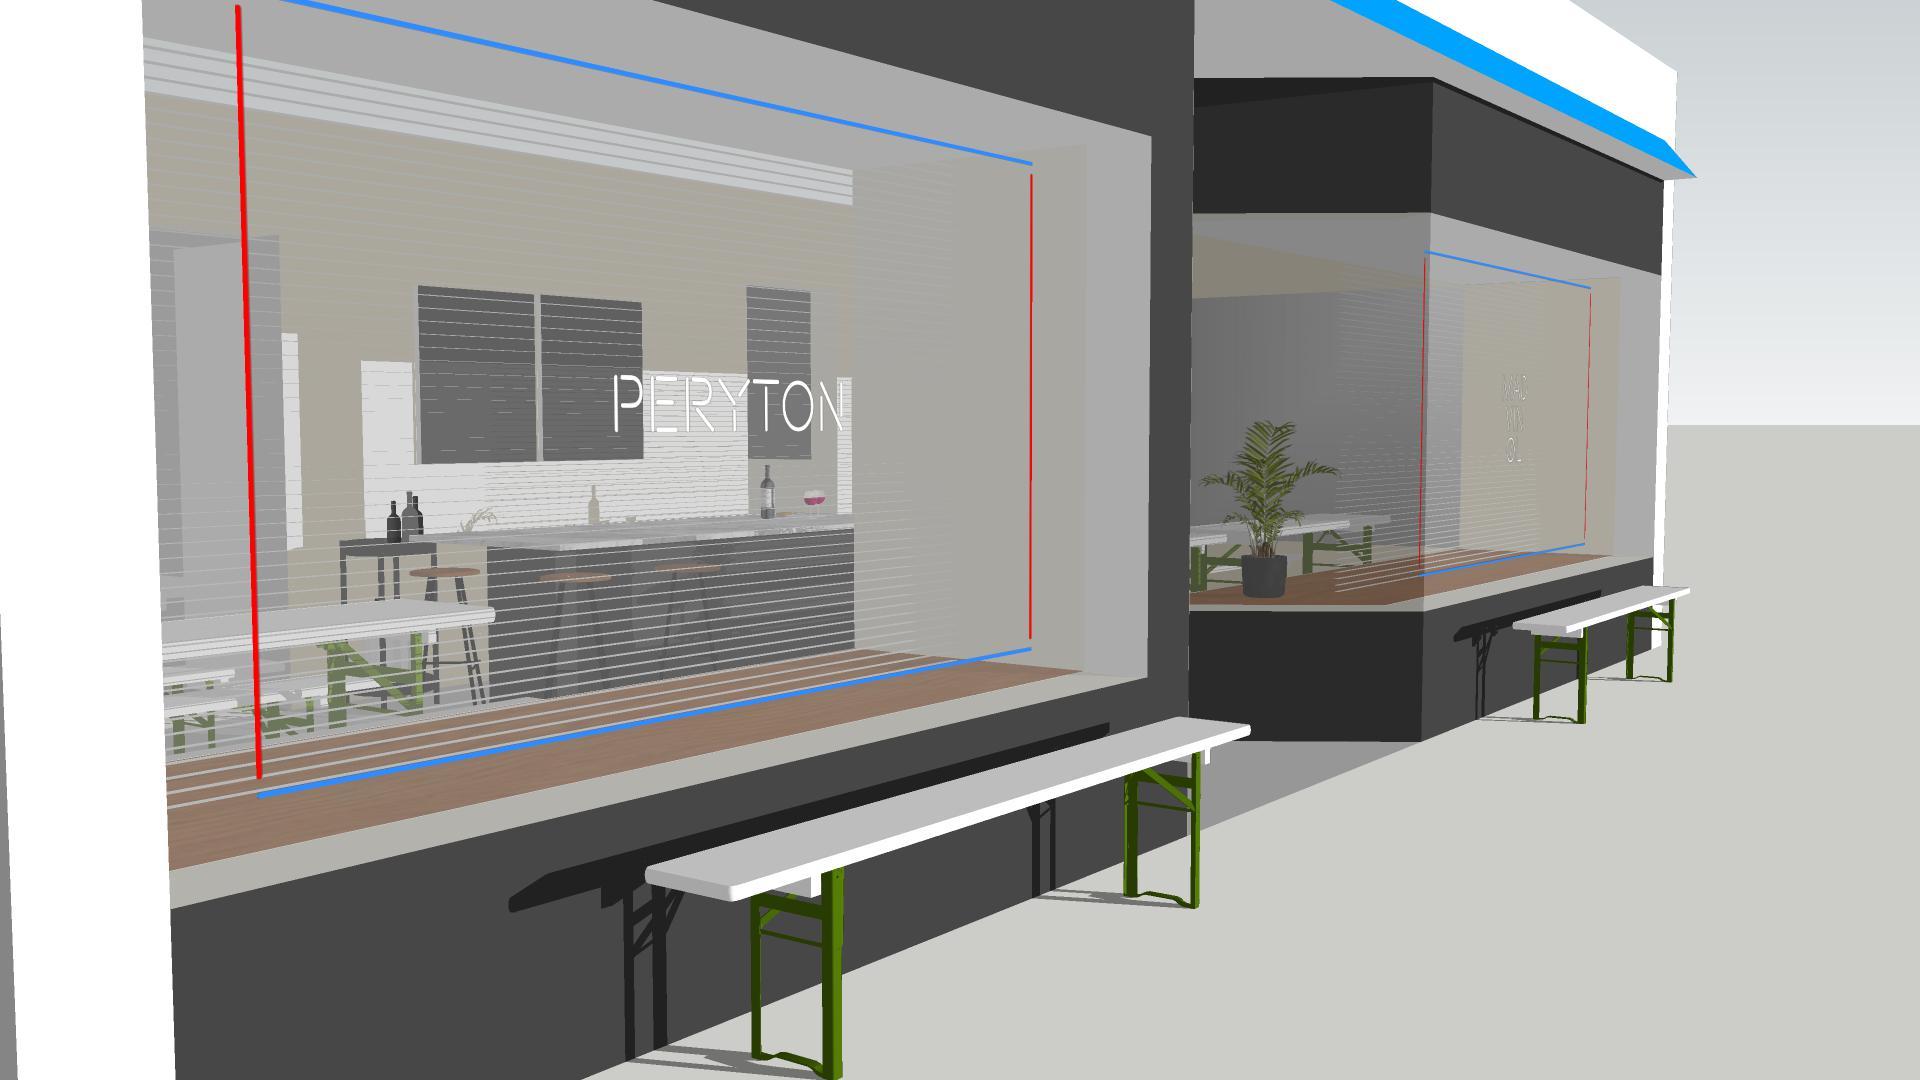 Peryton-Sketchup 6-wine bar0003.jpg